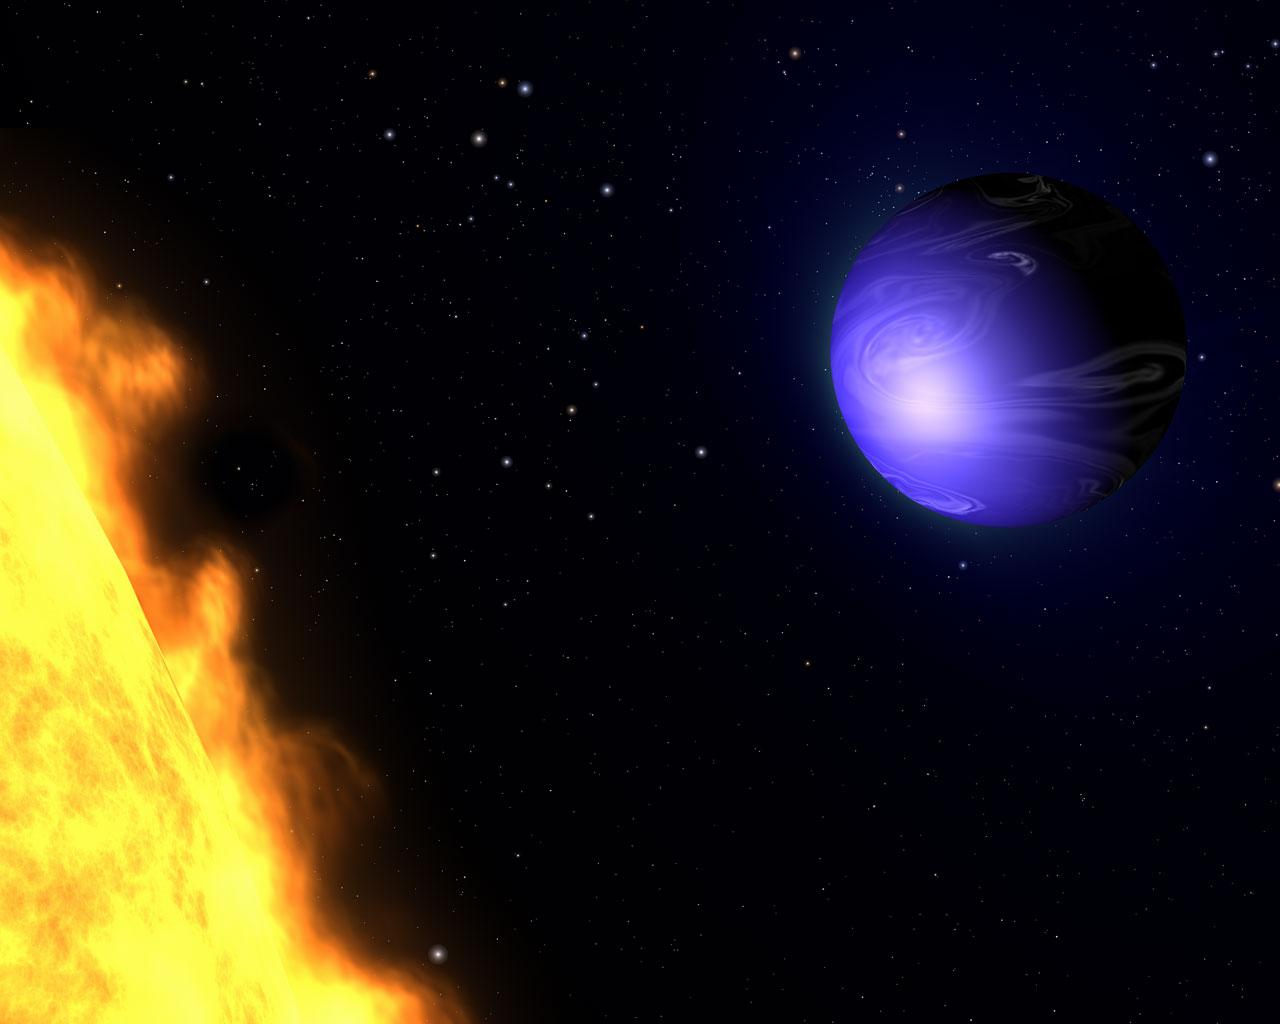 Bron: NASA/ESA